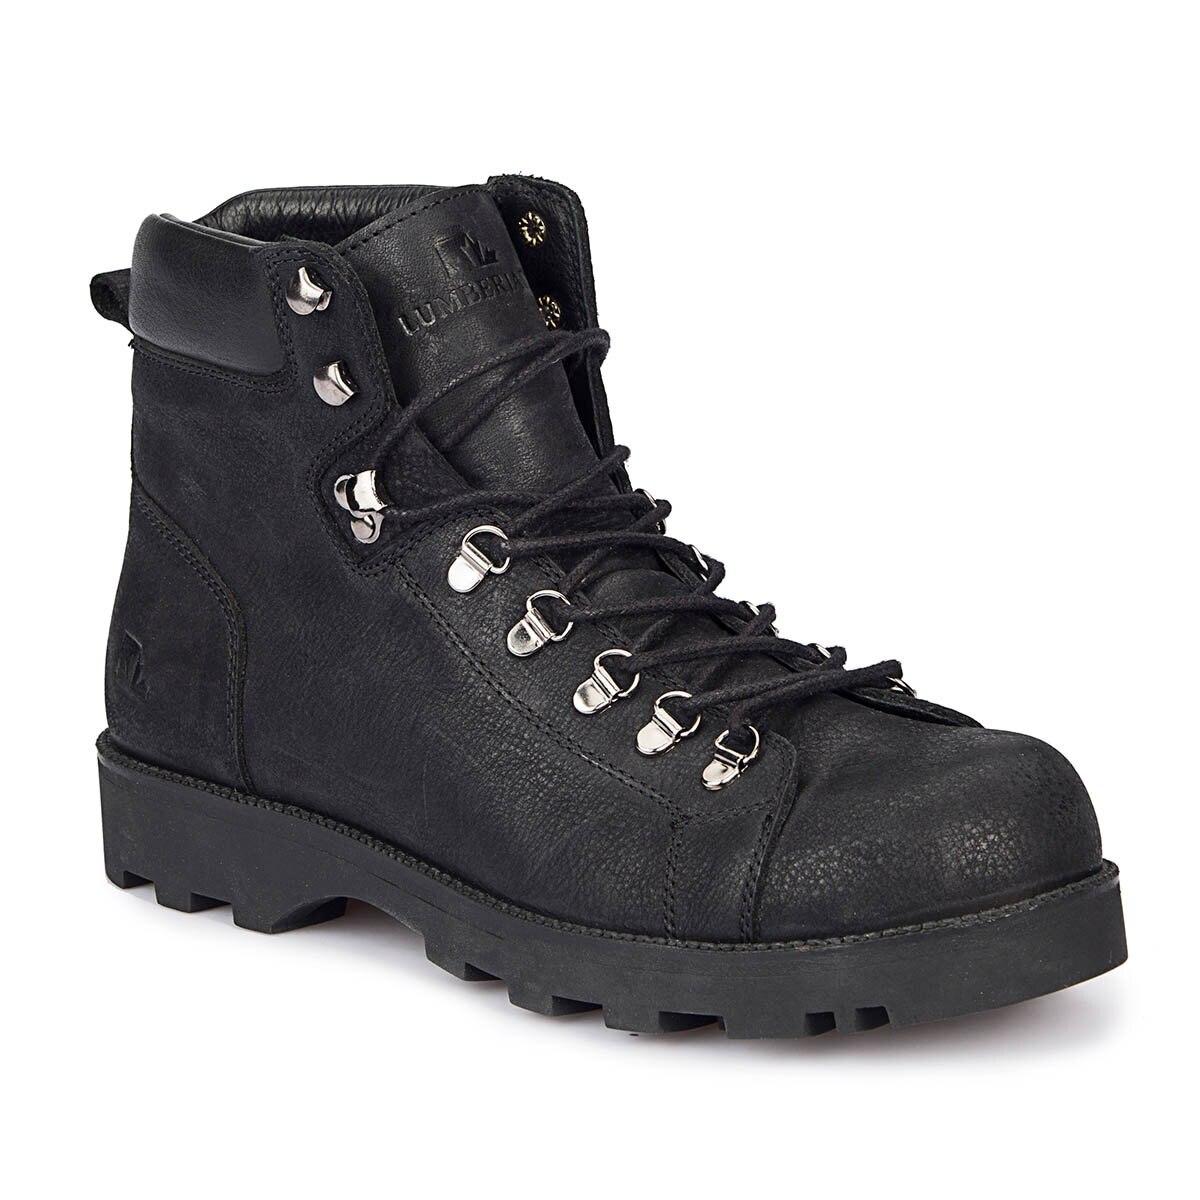 FLO ALTON Black Men Boots LUMBERJACK